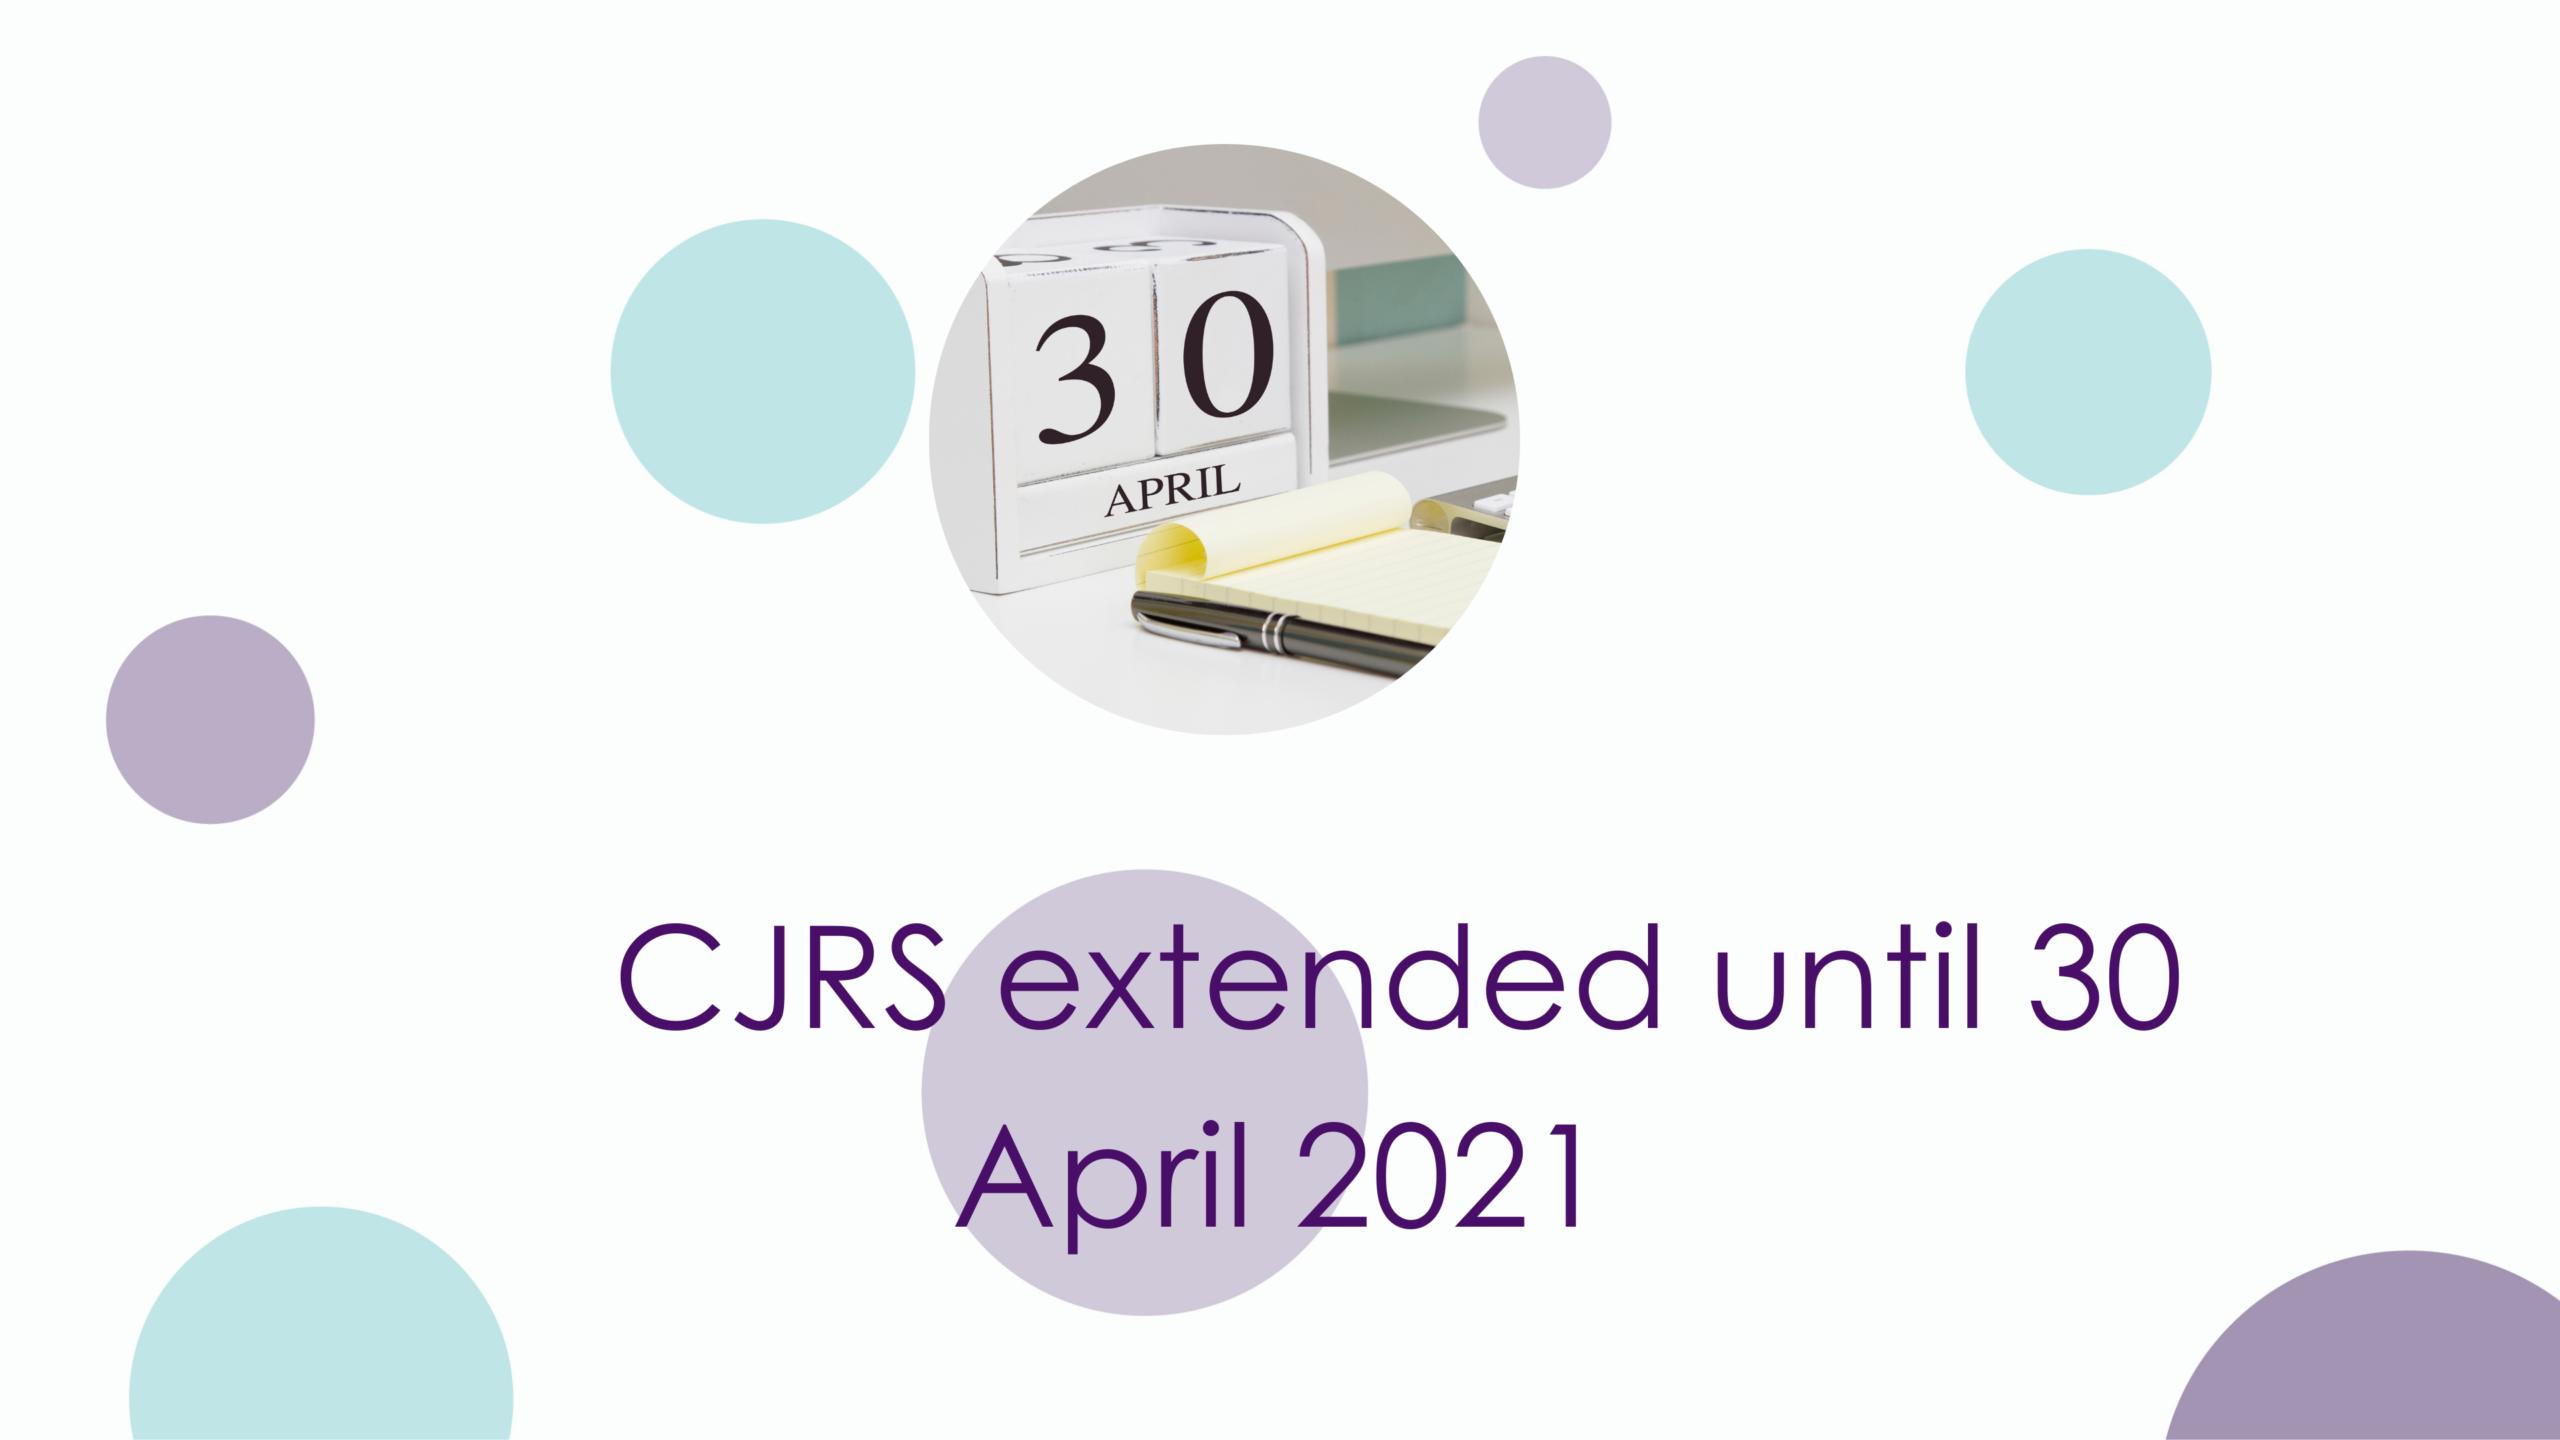 The Coronavirus Job Retention Scheme has been extended until 30 April 2021